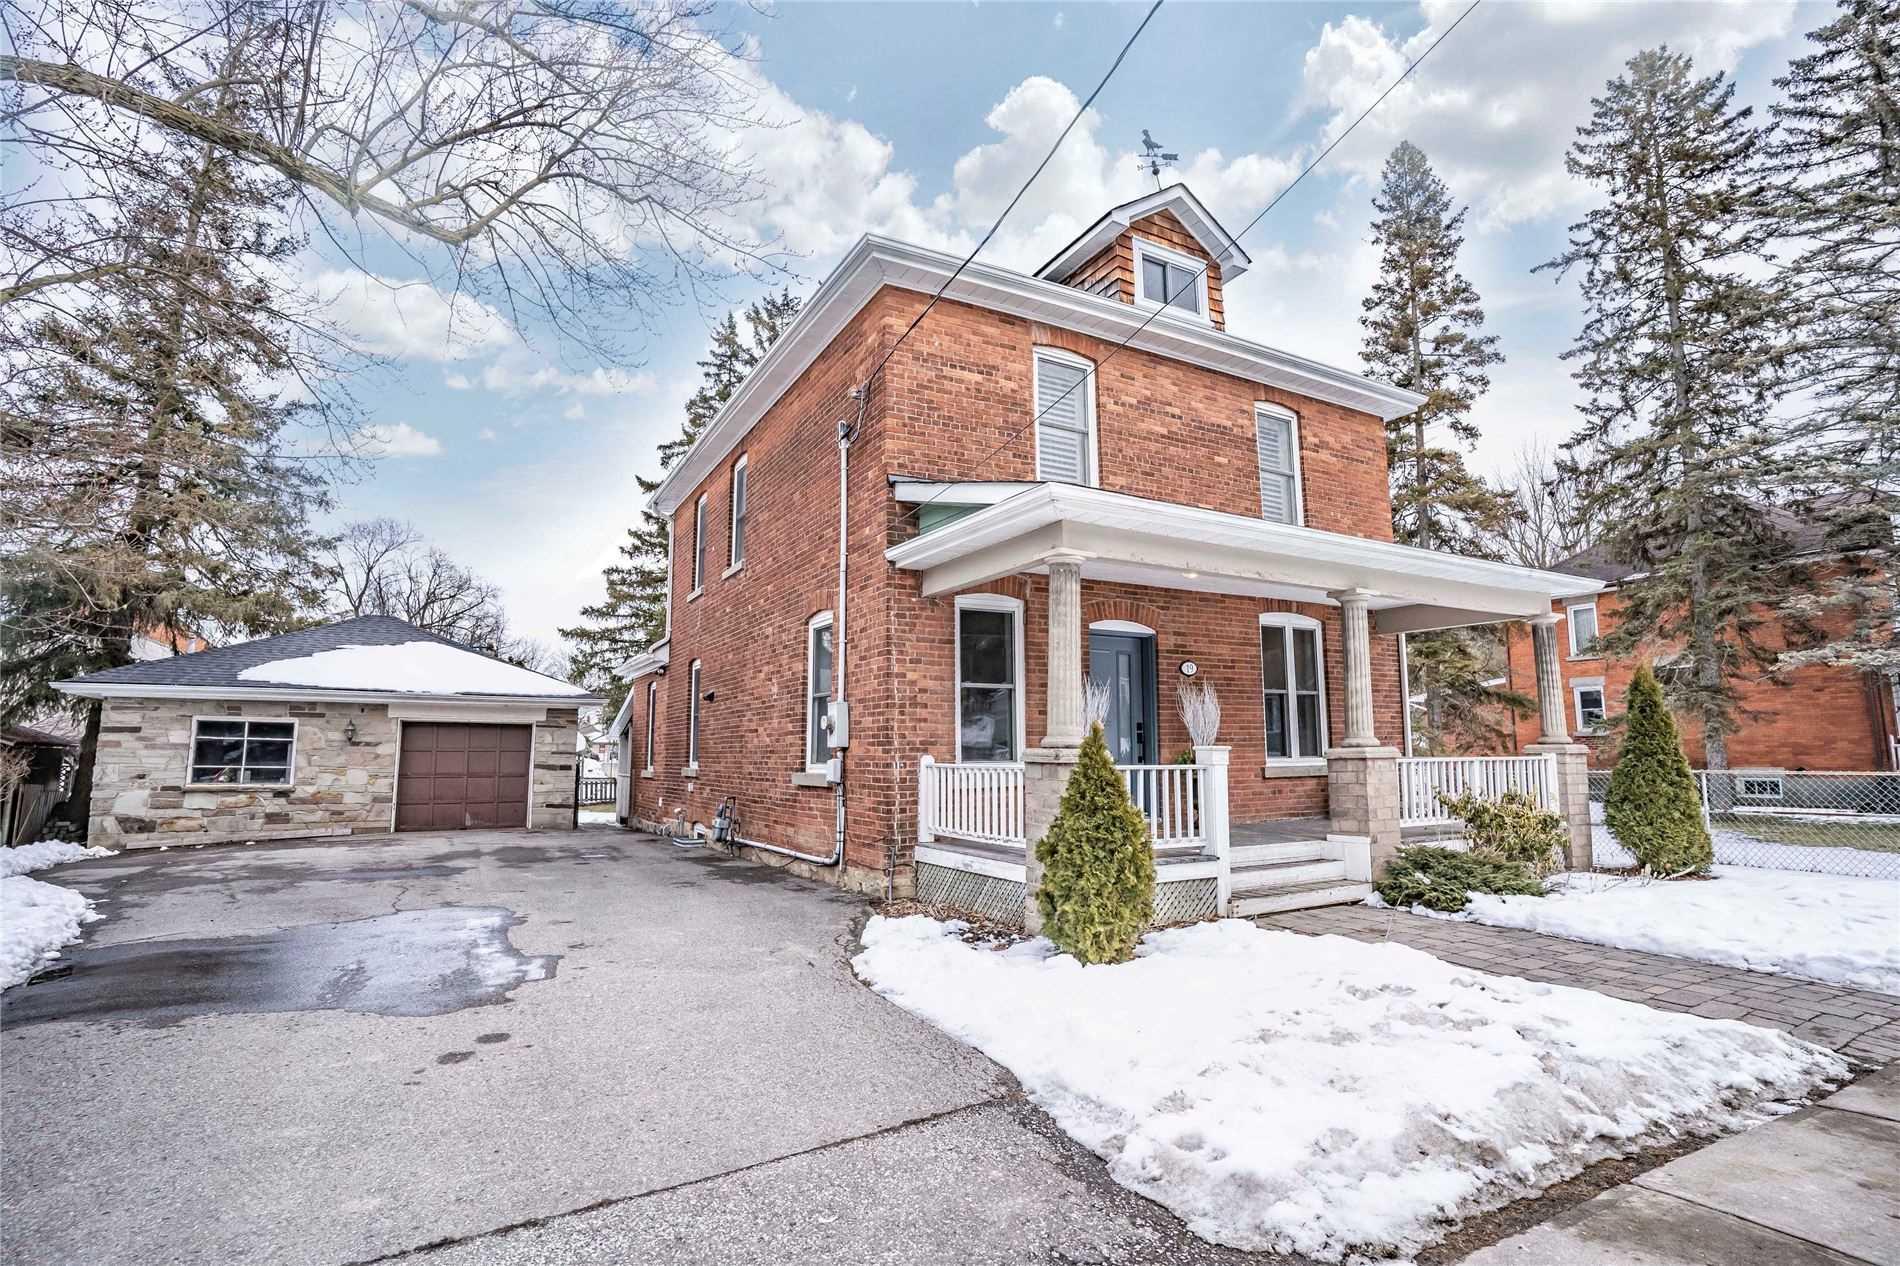 19 Jane St, Caledon, Ontario (ID W4686225)